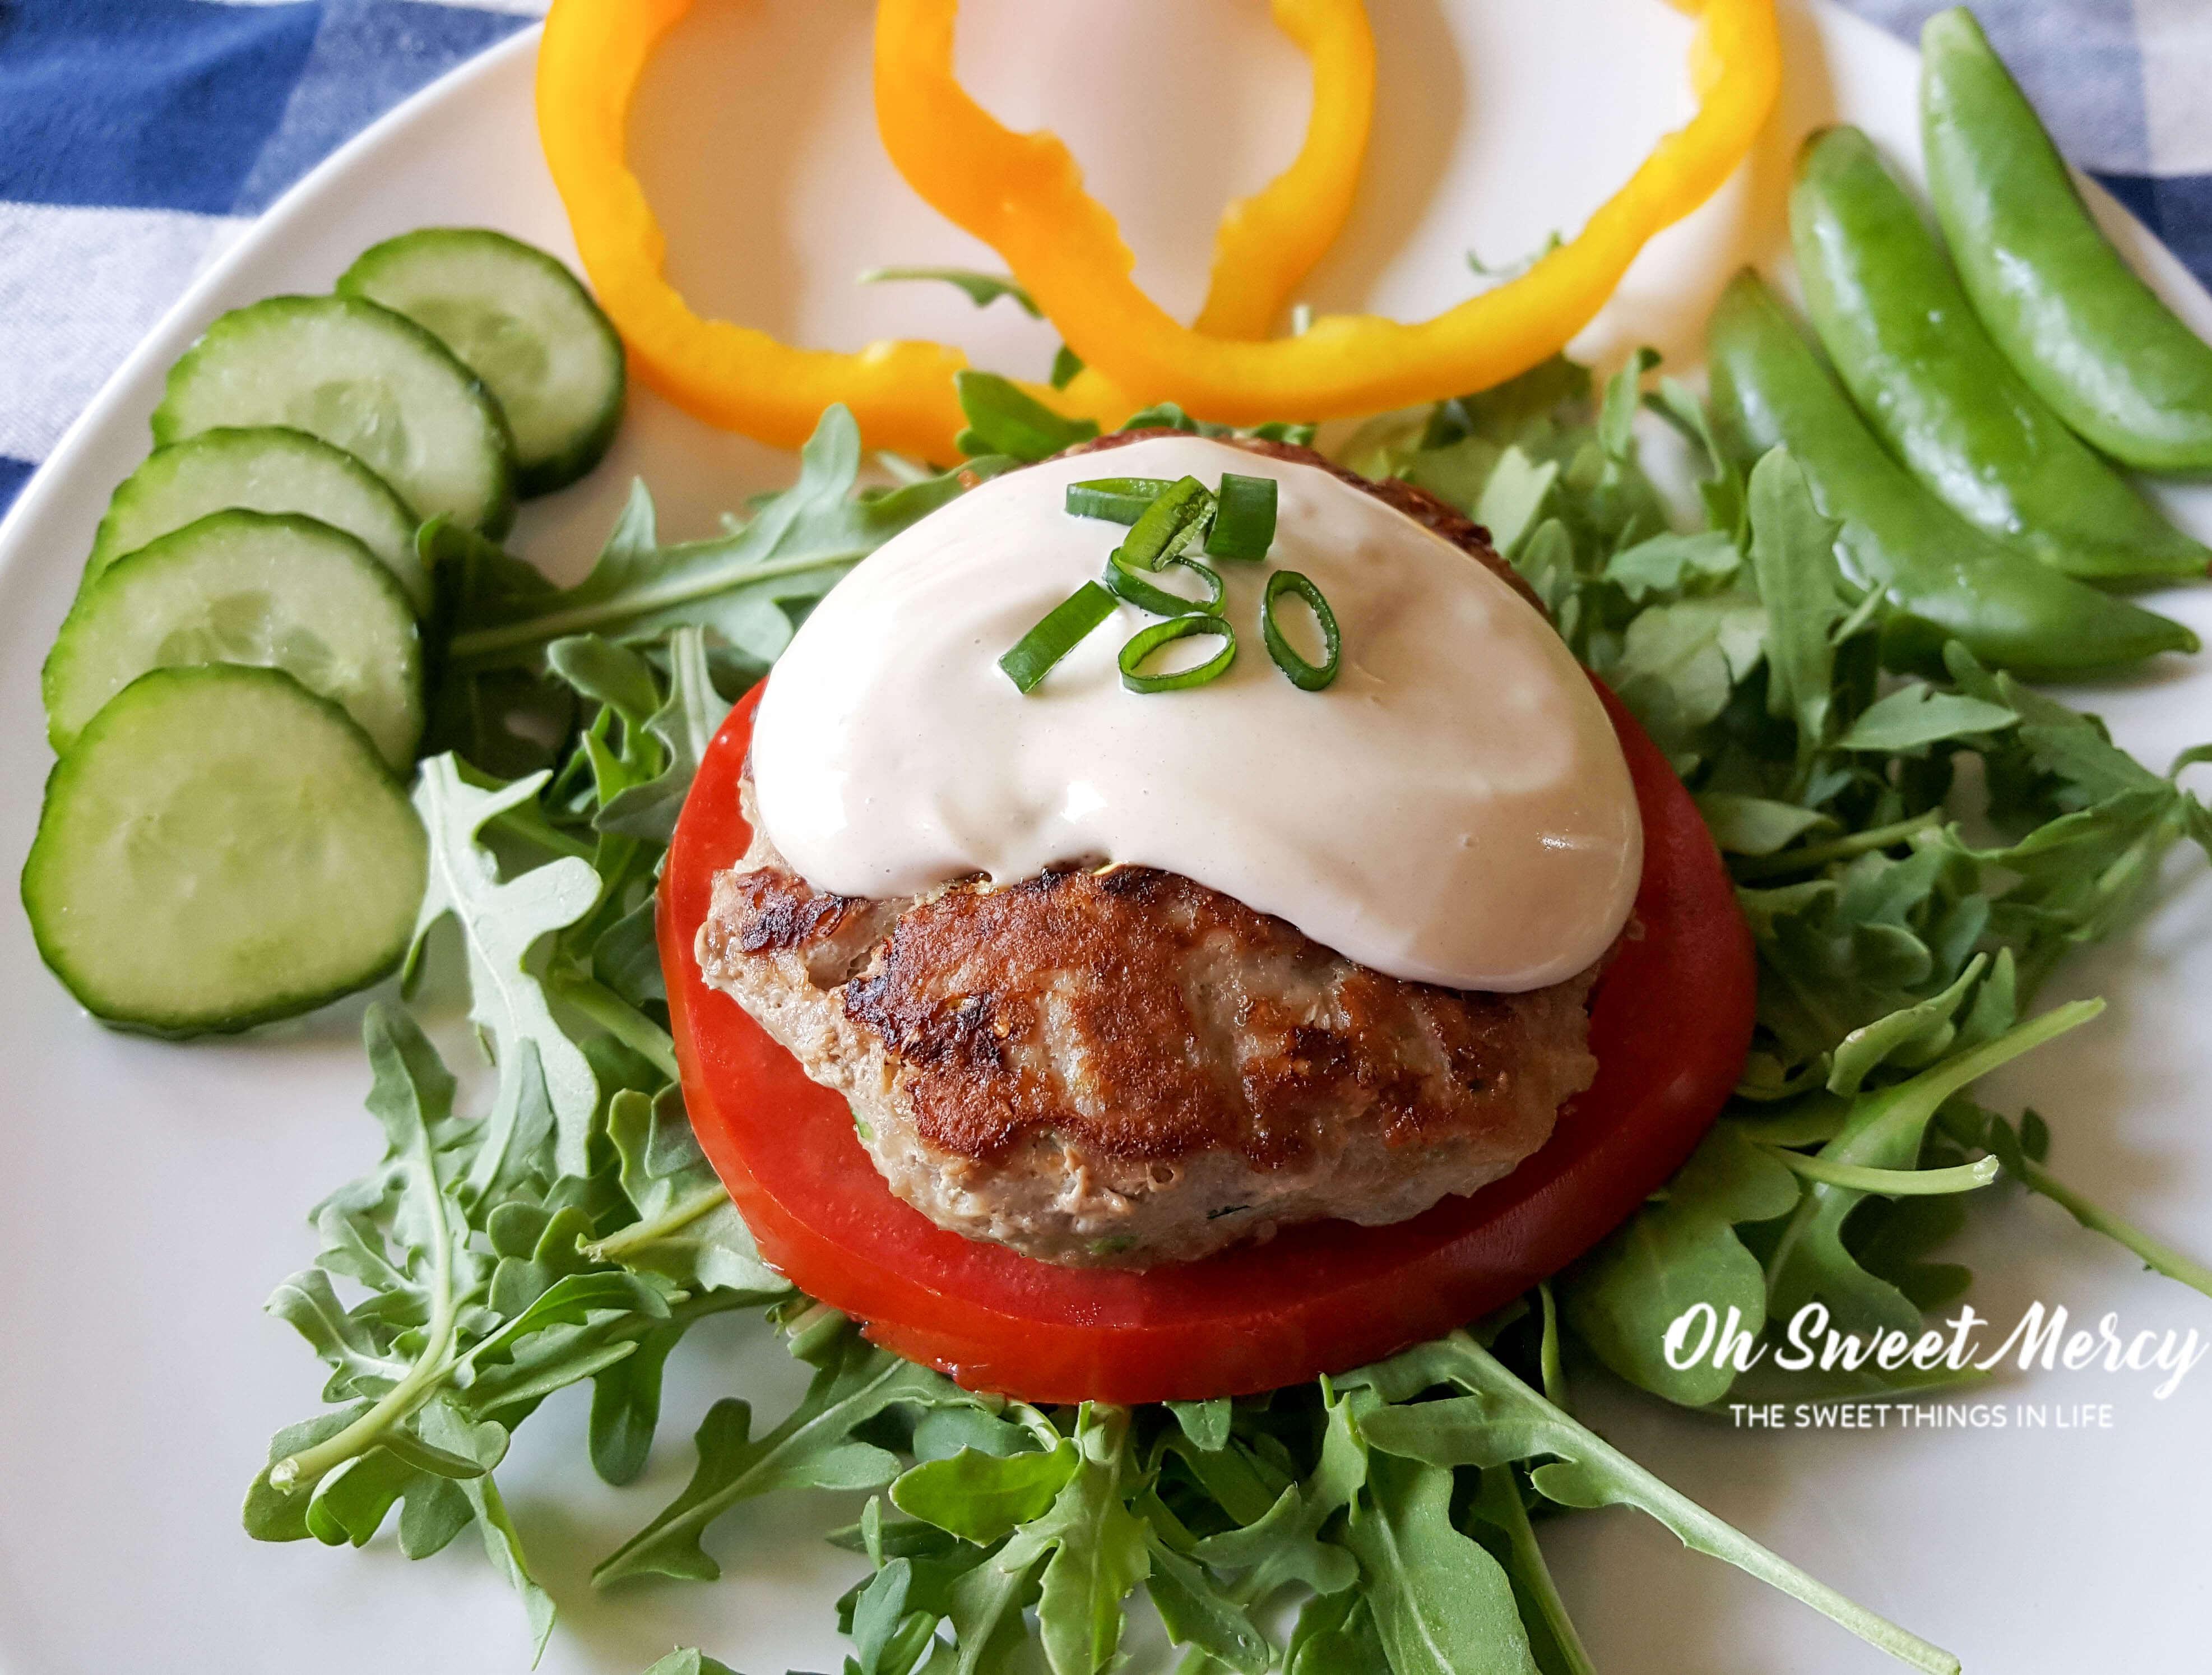 Garlic Zucchini Turkey Burgers with Creamy Dijon Sauce - Oh Sweet Mercy